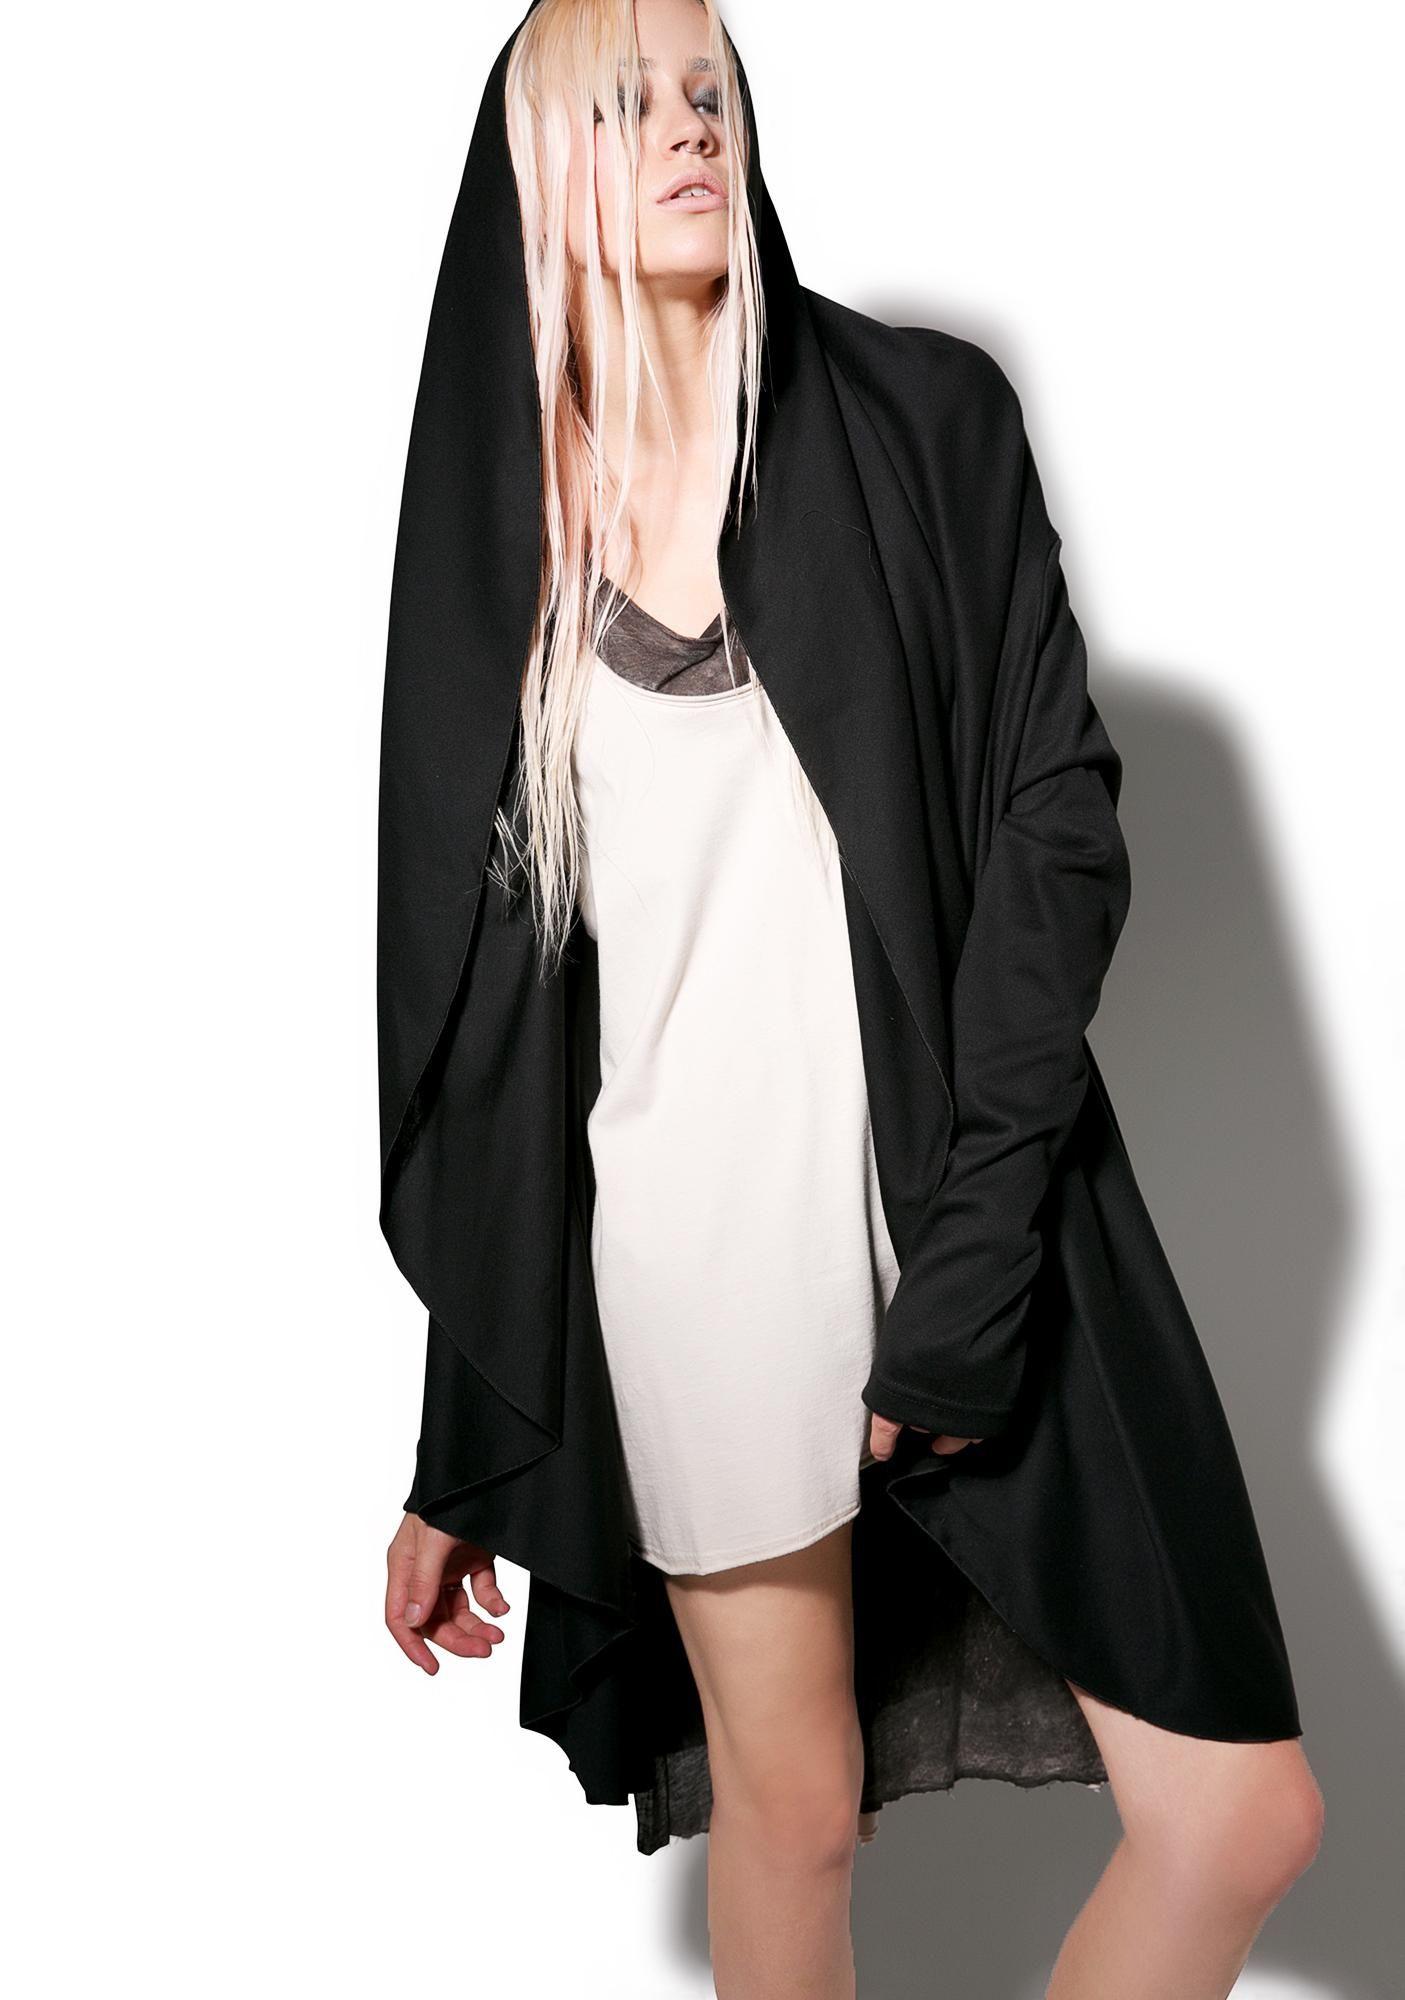 Twilight Hooded Cardigan | Hooded cardigan, Bb and Unisex style